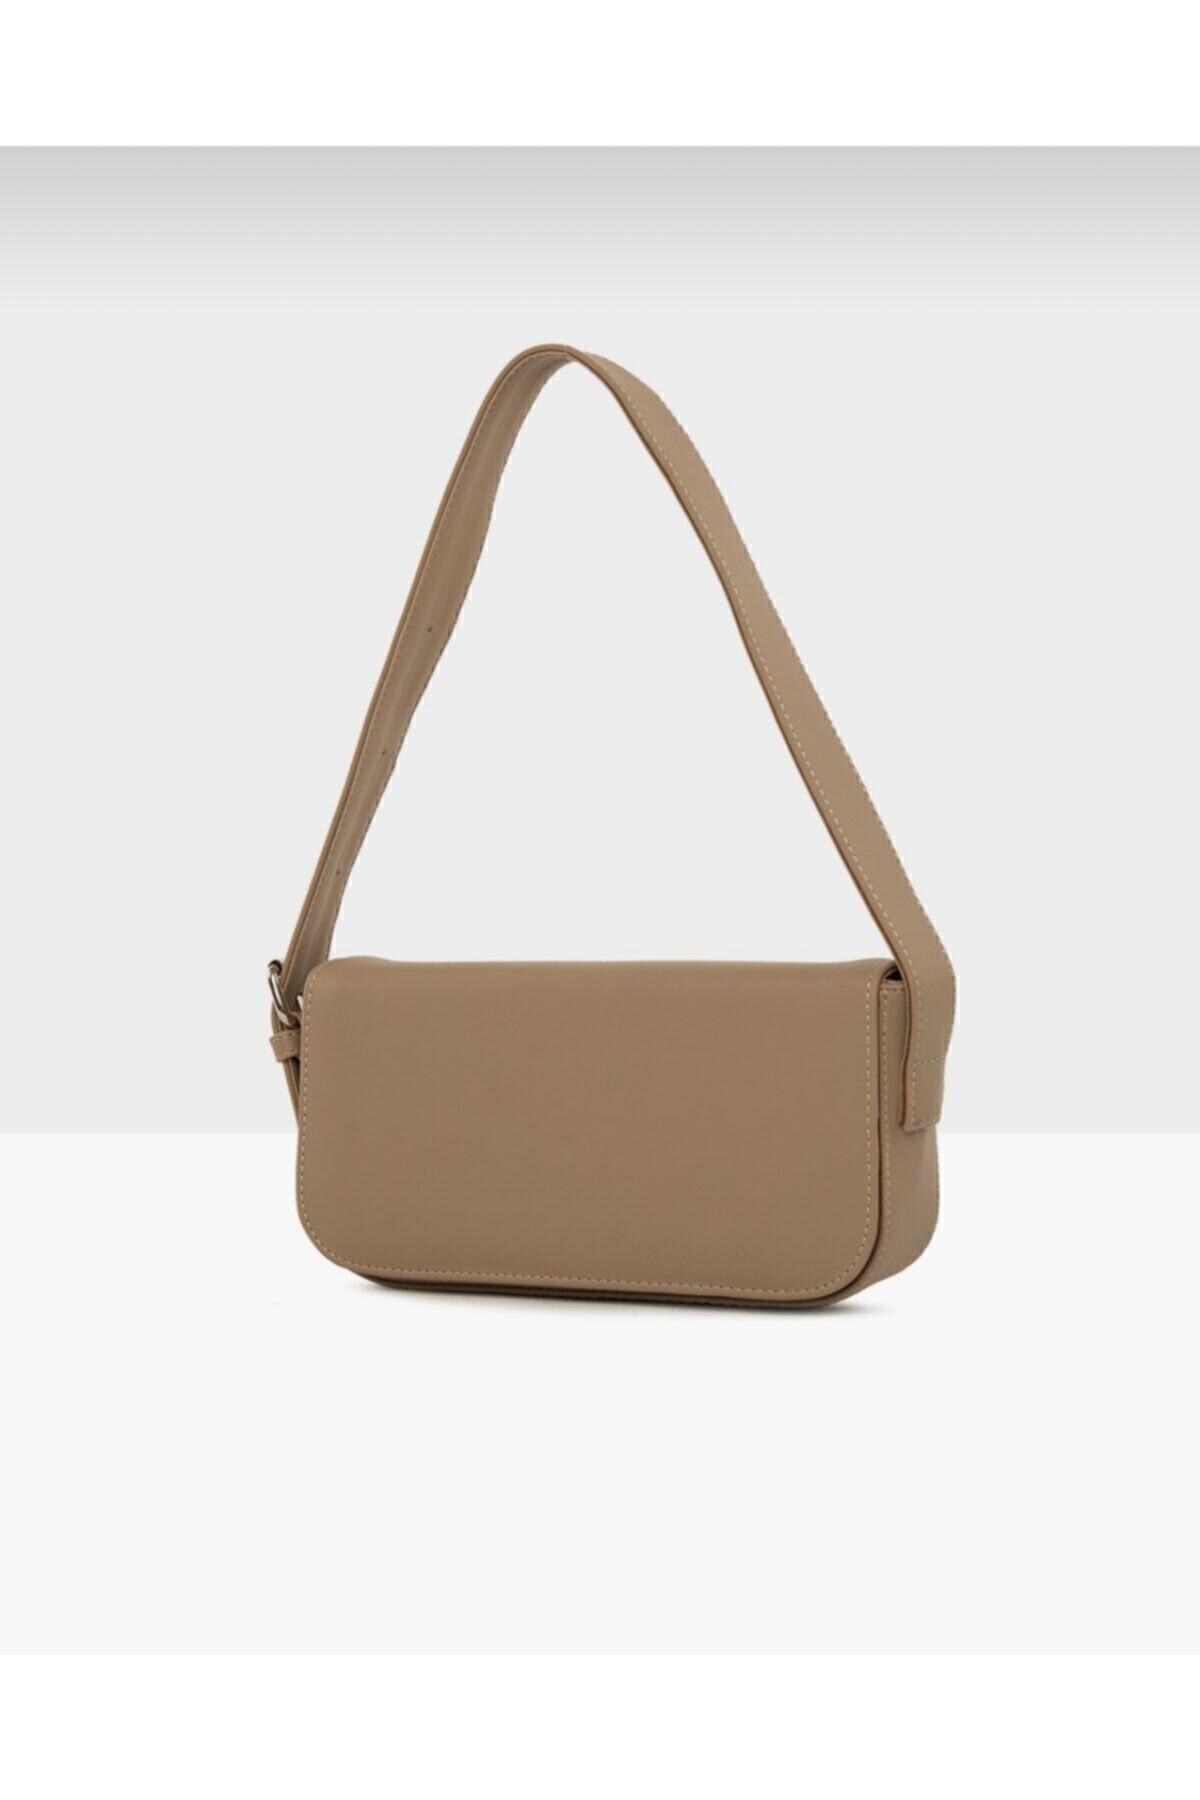 bag&more Kadın Vizon Kapaklı Baget Çanta 2